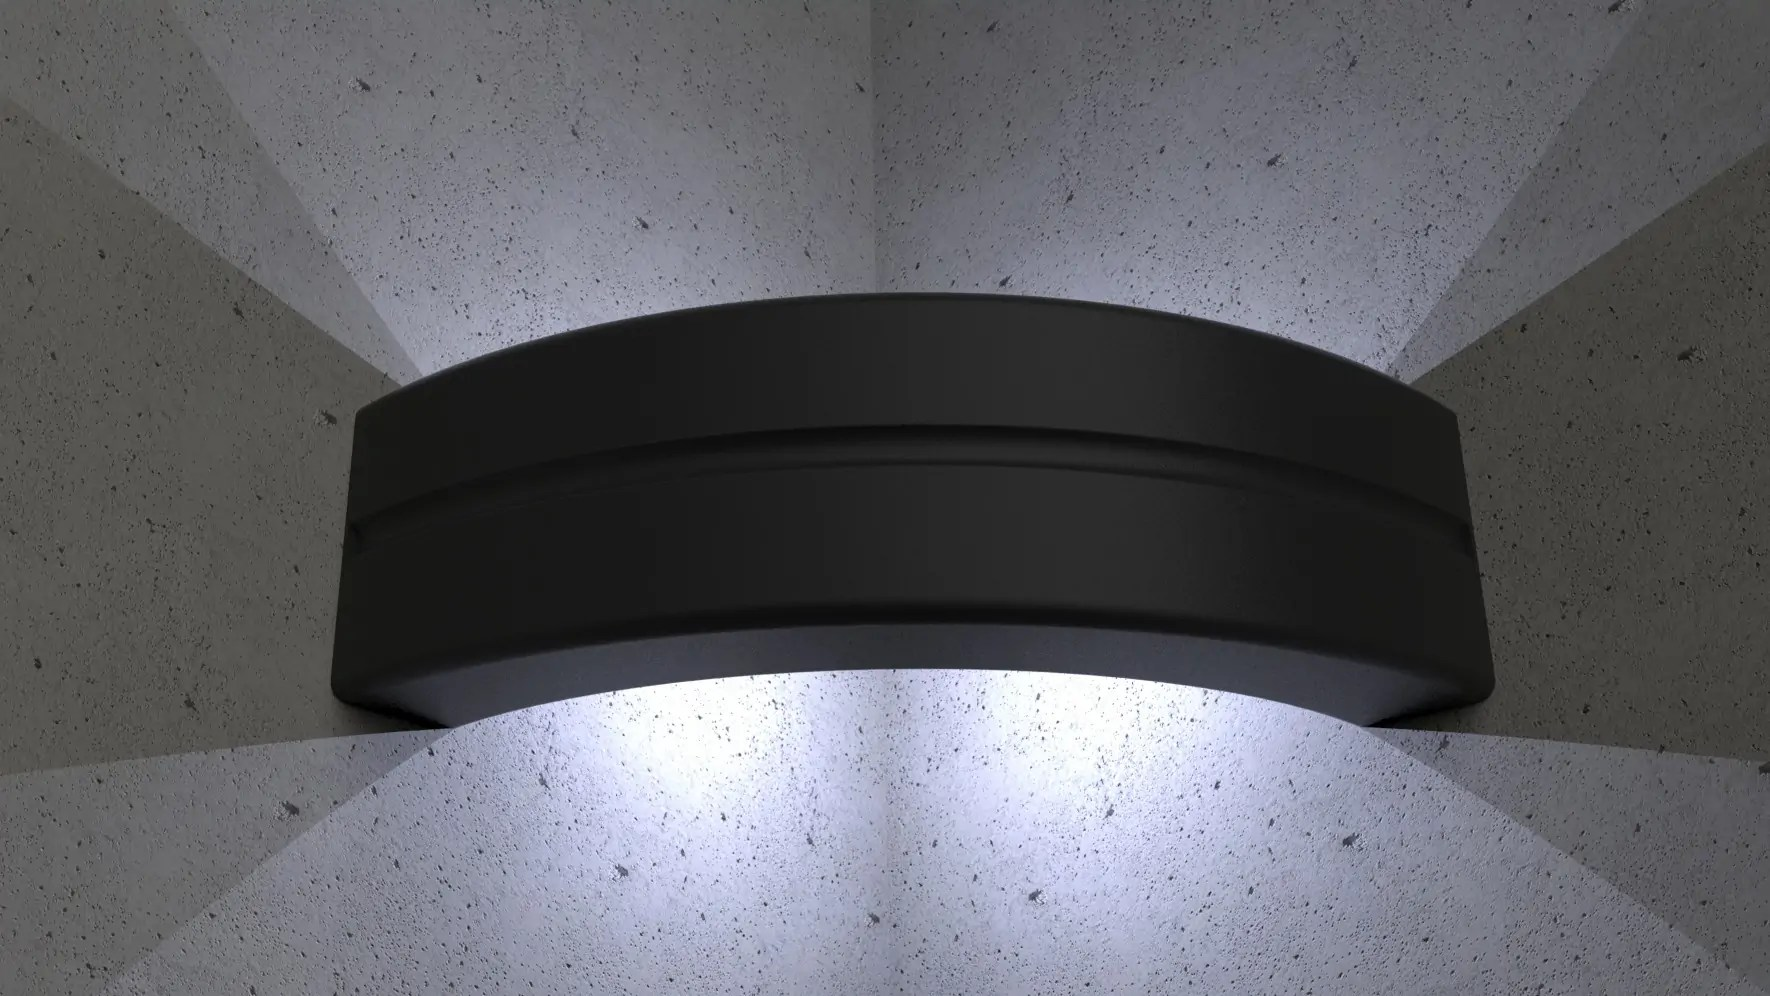 Model of the week corner wall light design cue the ambiance model of the week corner wall light design cue the ambiance solidsmack mozeypictures Images